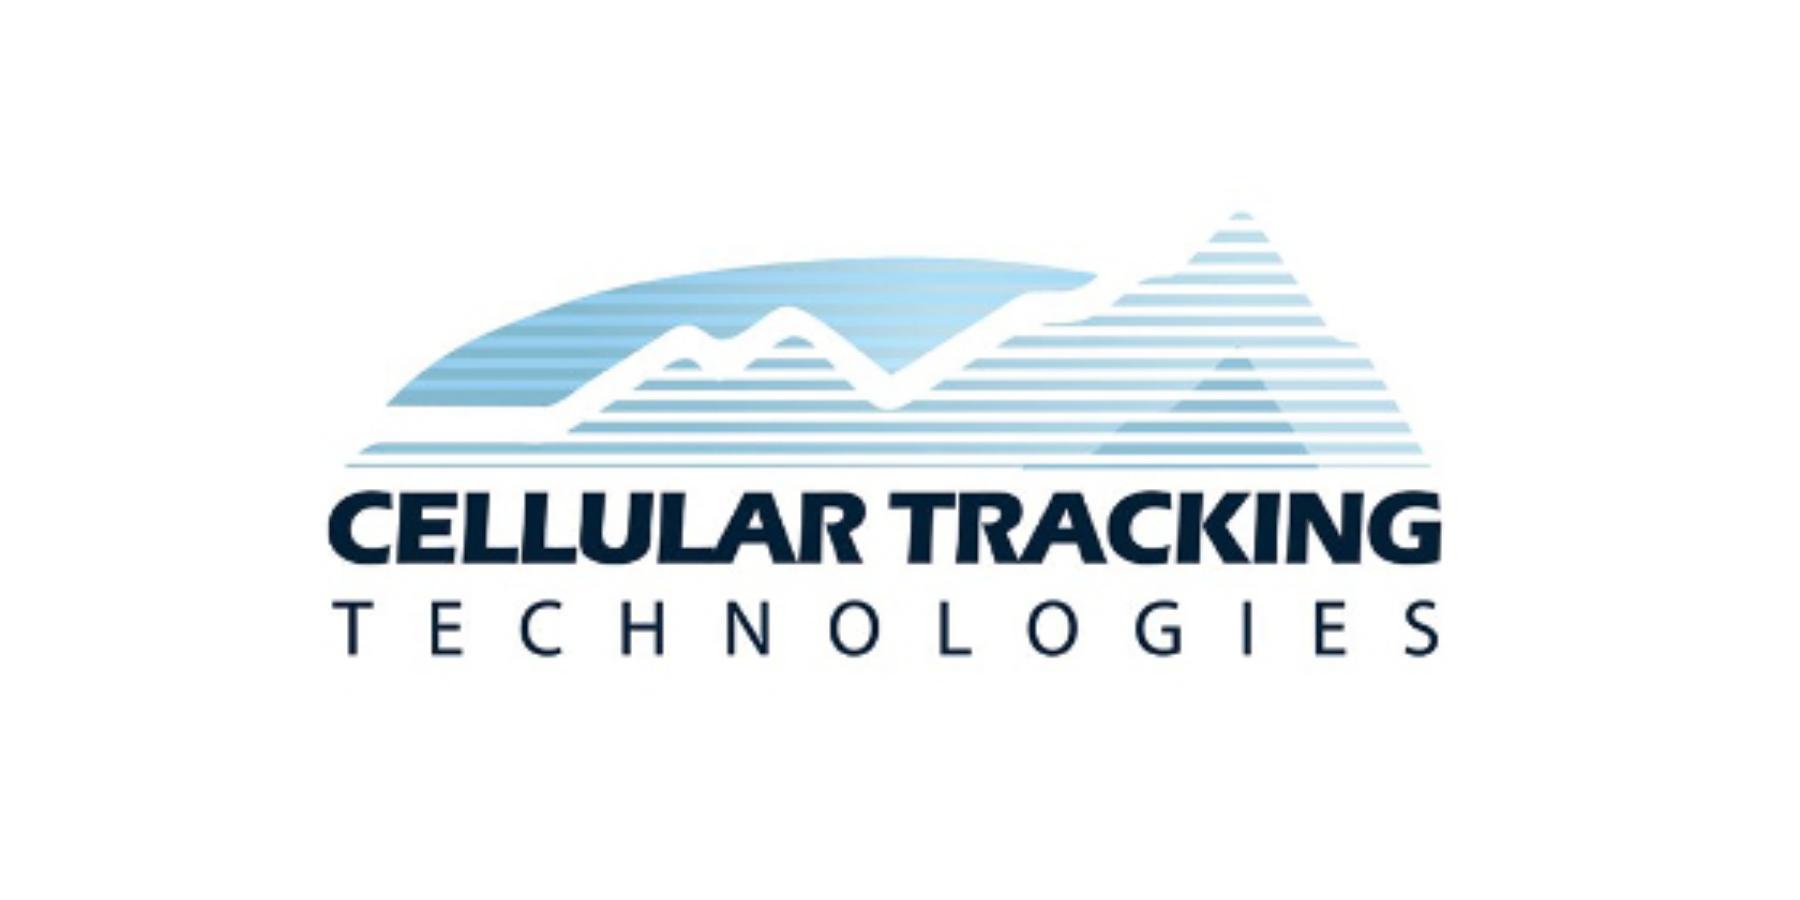 Cellular Tracking Technologies LLC